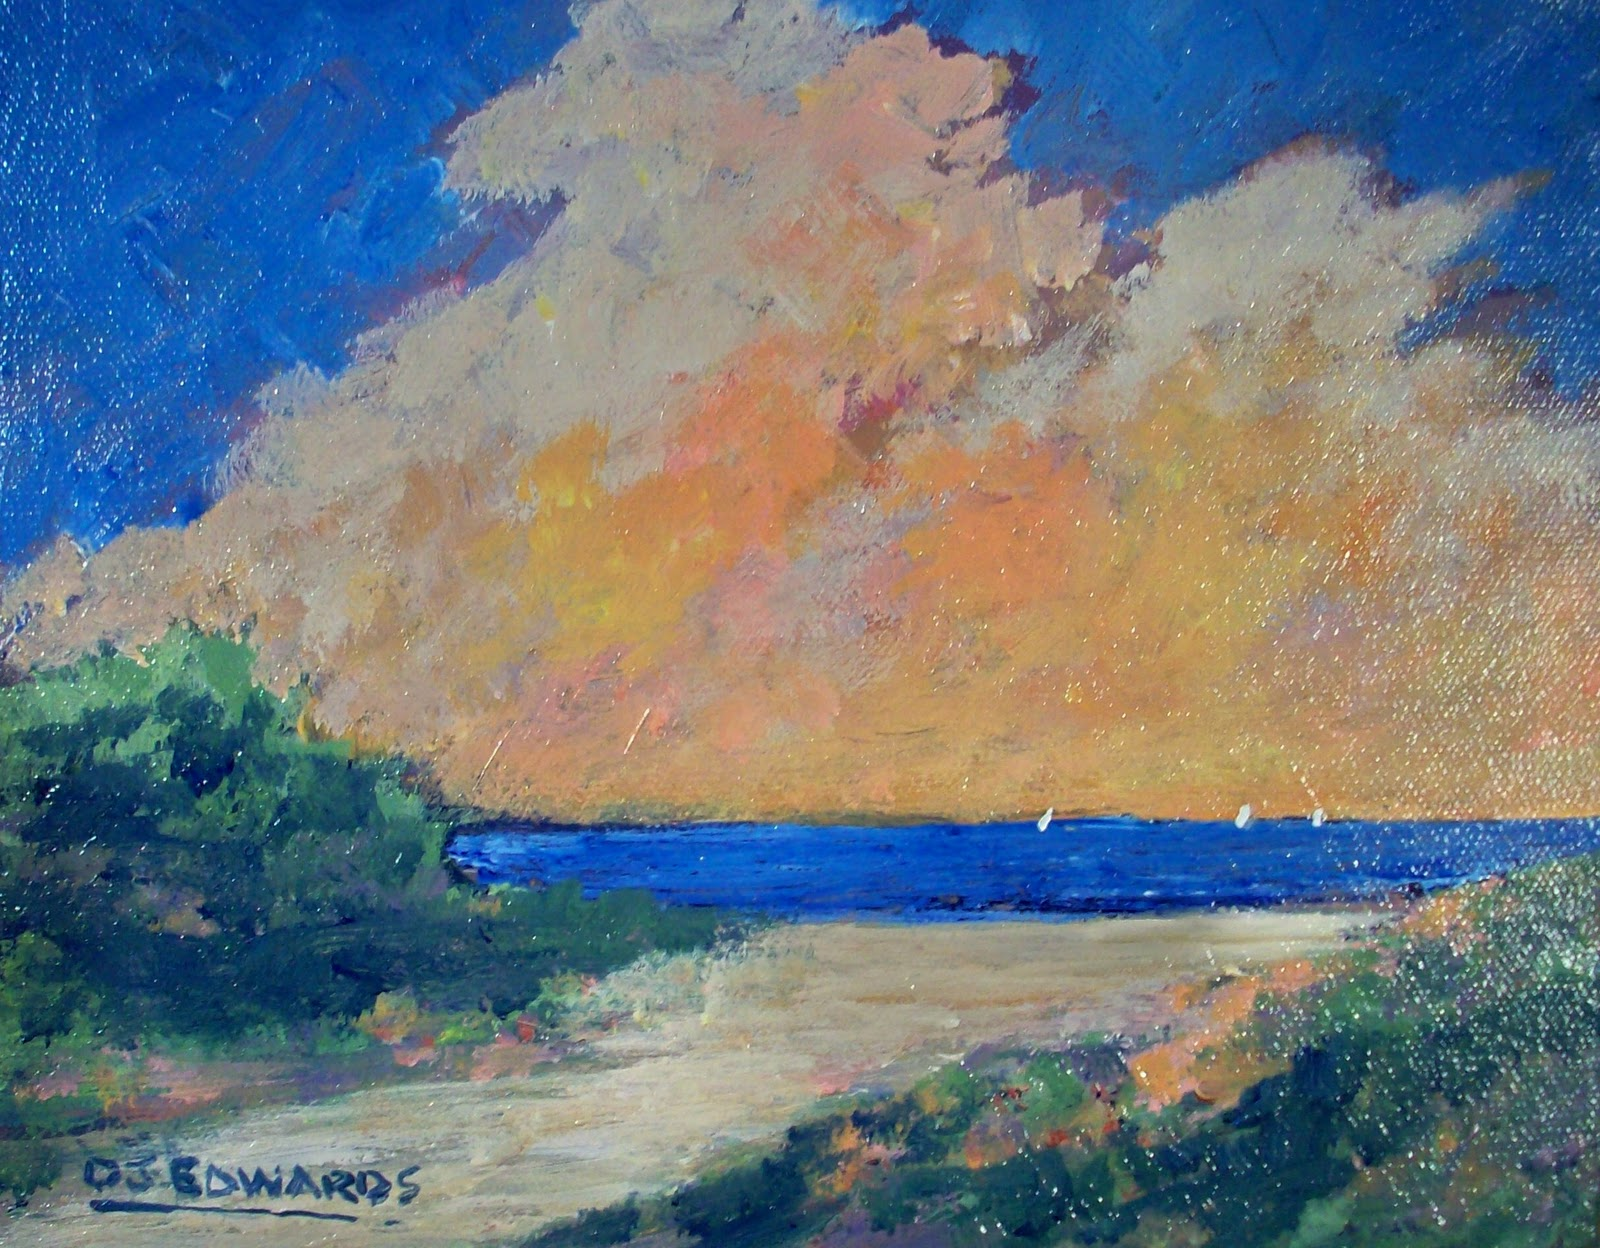 DAVID J EDWARDS PAINTINGS: Beach Path - New acrylic ...